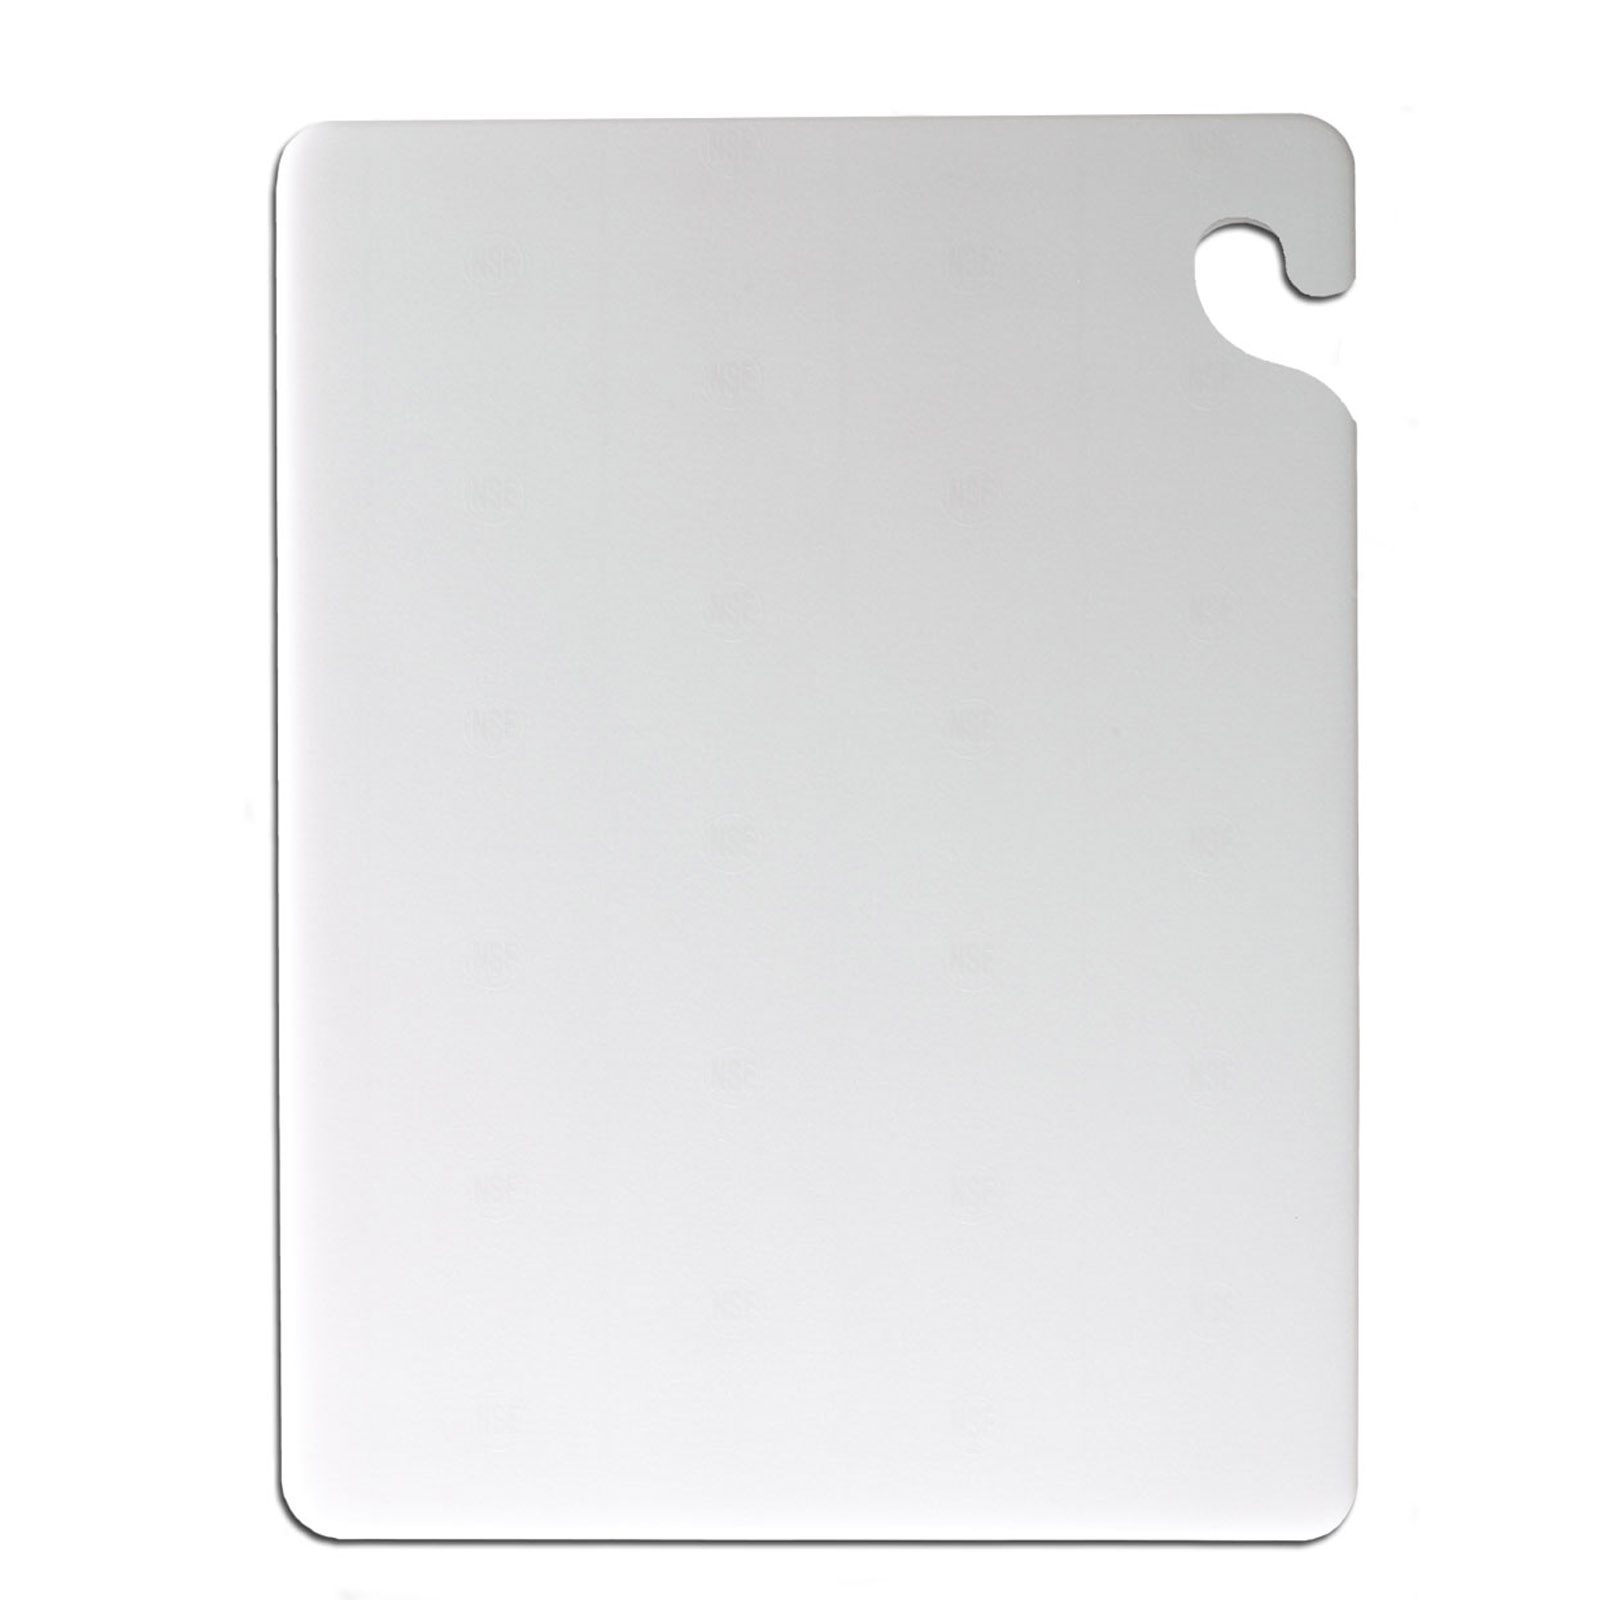 San Jamar CB121812WH cutting board, plastic